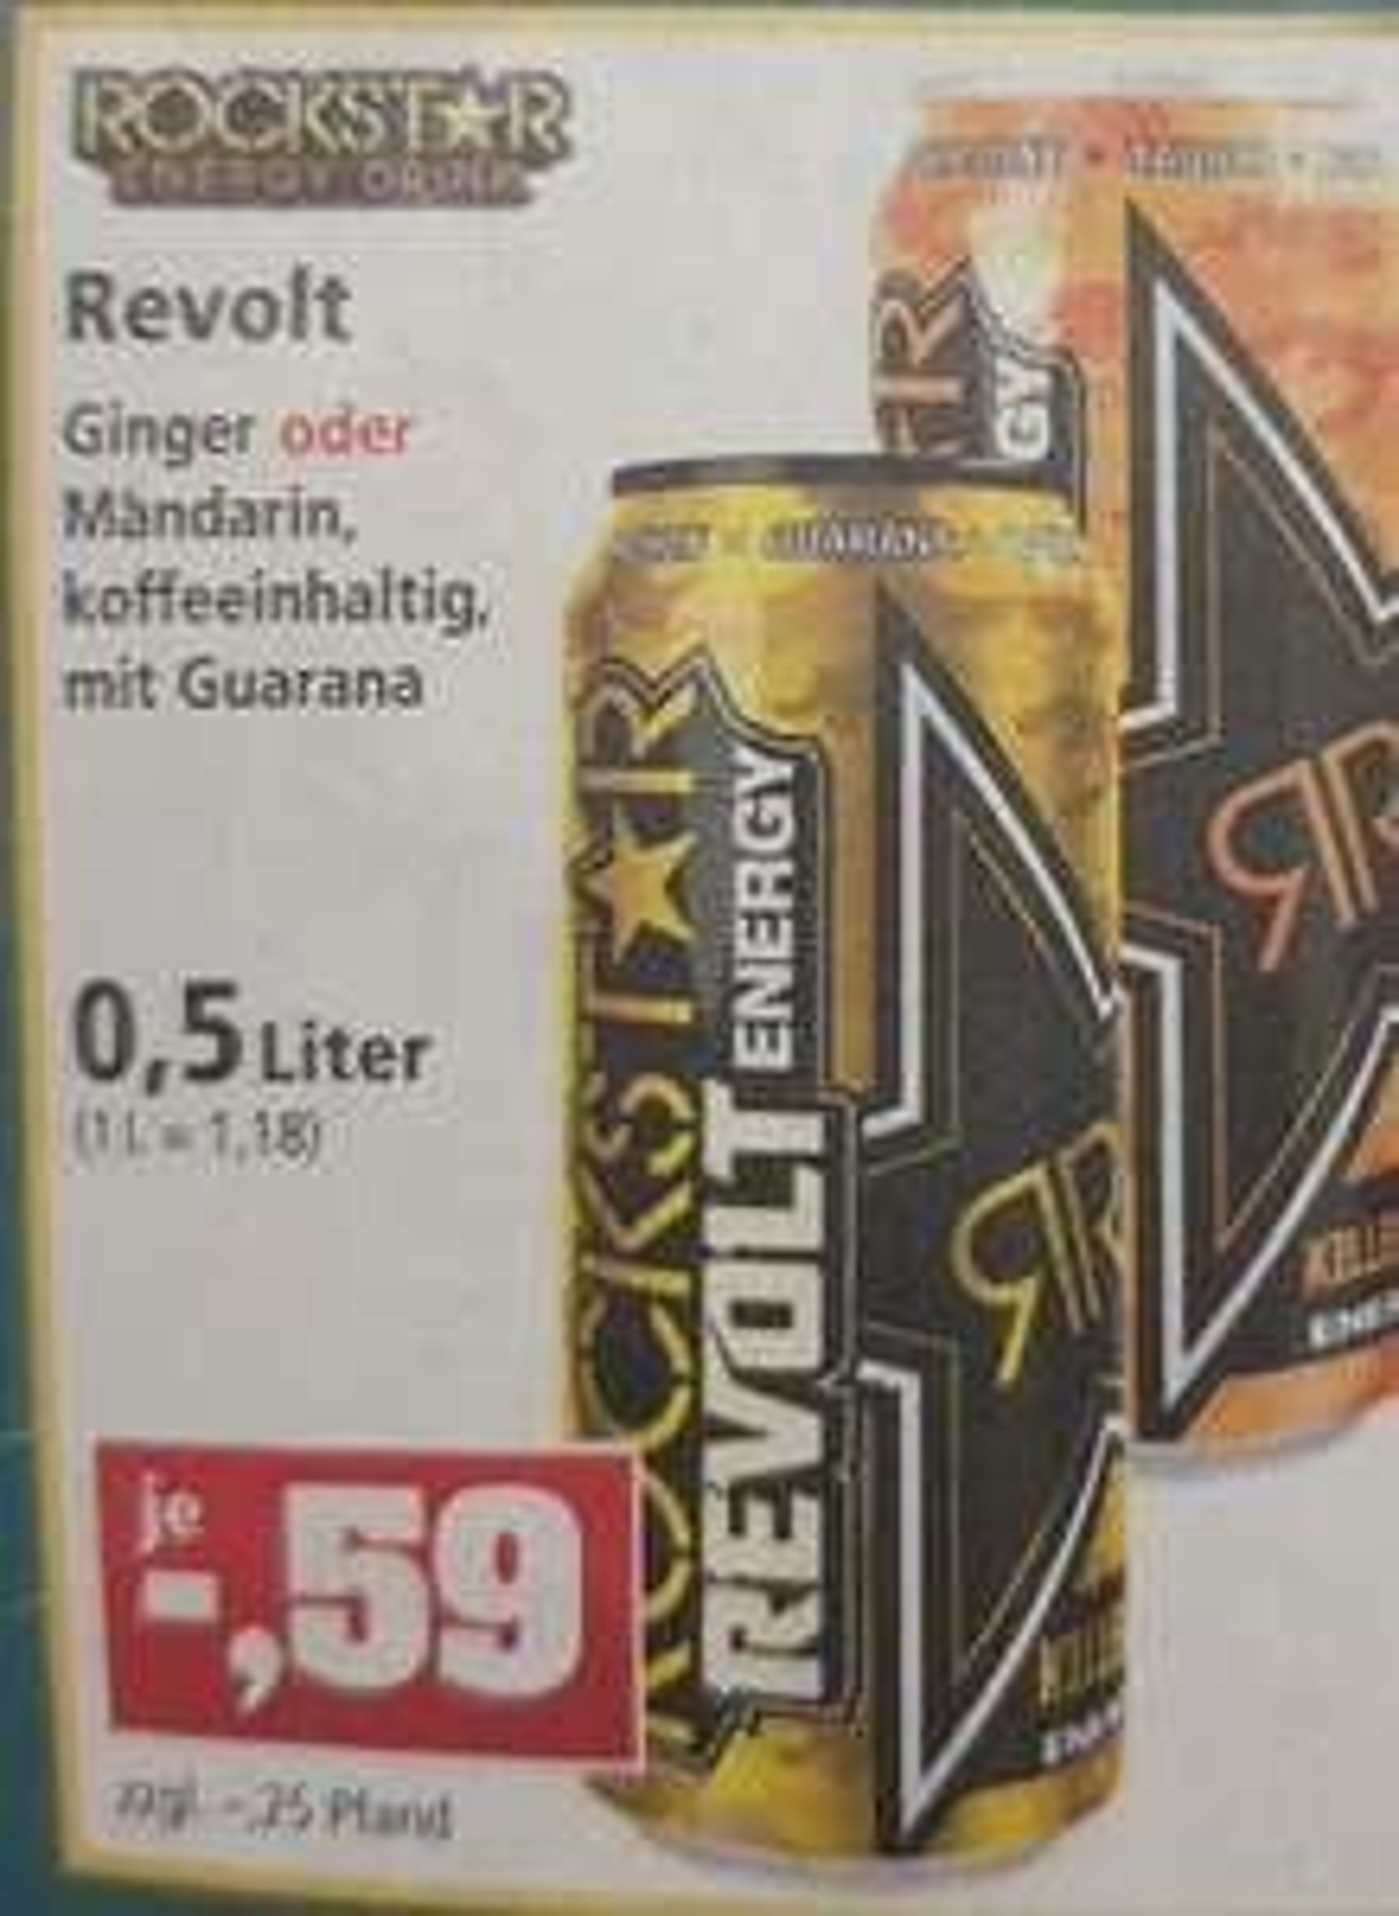 [ Thomas Philipps] Rockstar Energy 0,5l Revolt Ginger oder Mandarin nur 0,59€